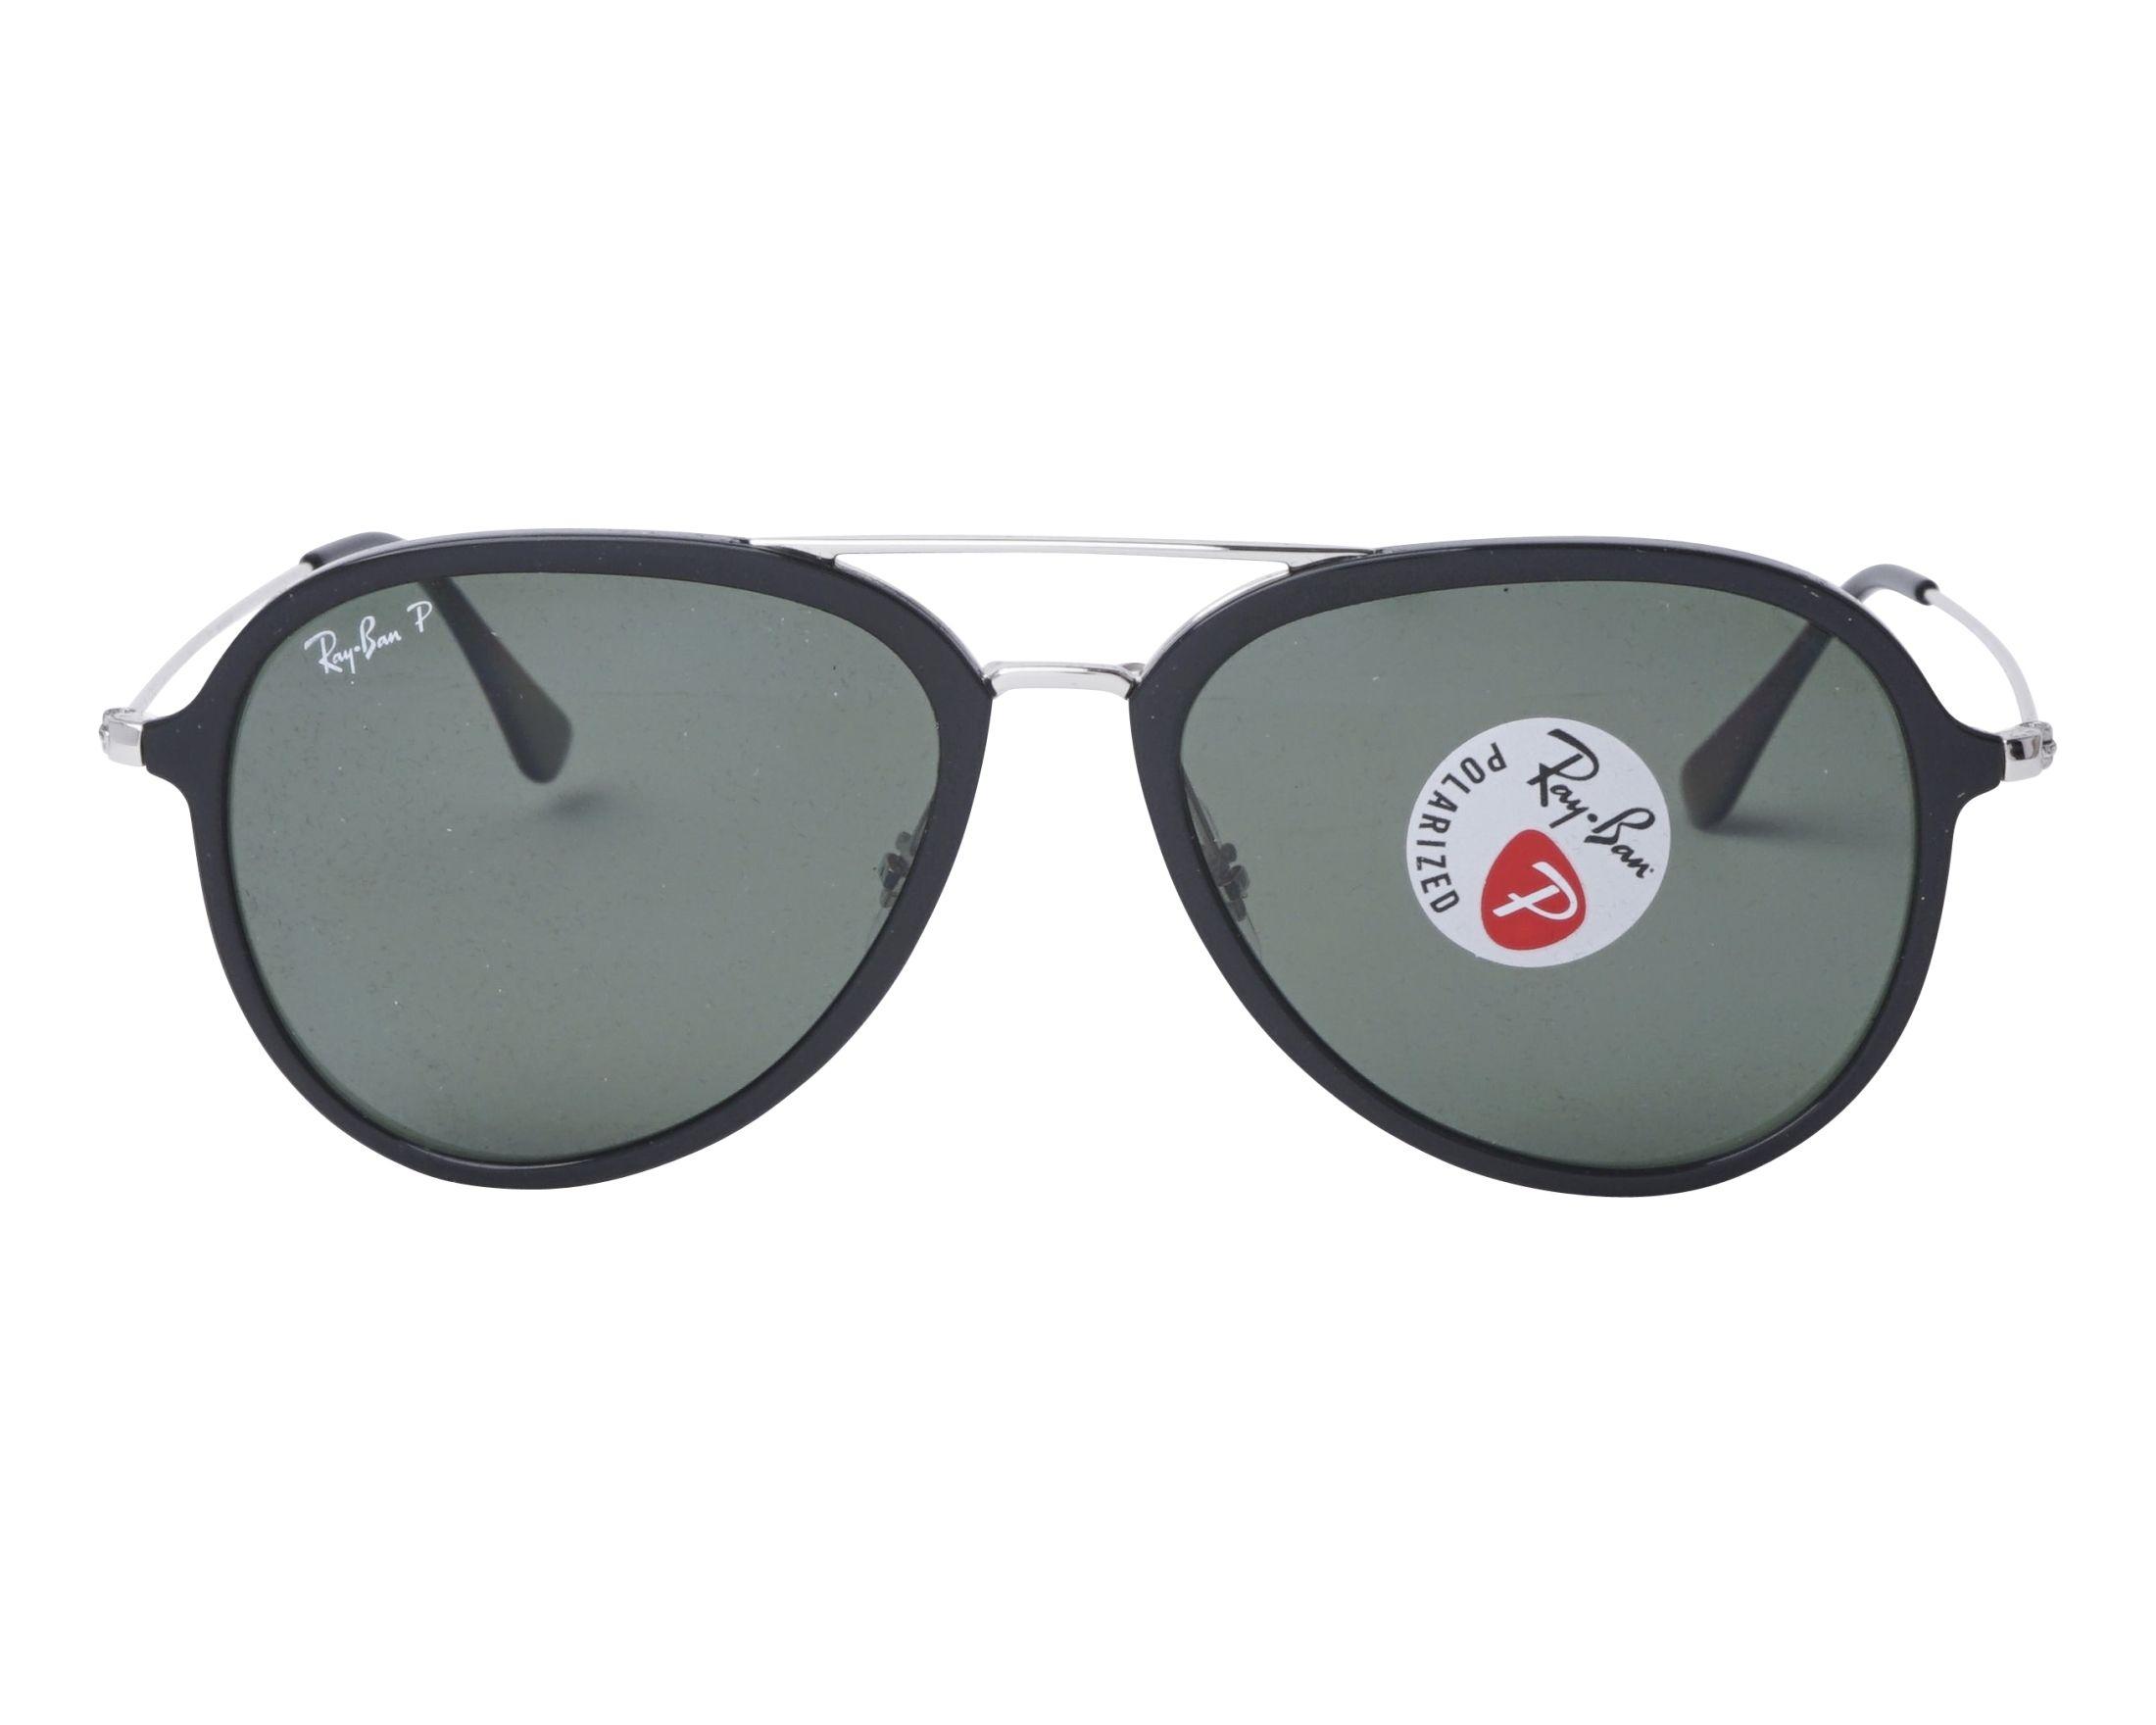 Sunglasses Ray-Ban RB-4298 601 9A 57-17 Black Silver front d95ca97da3